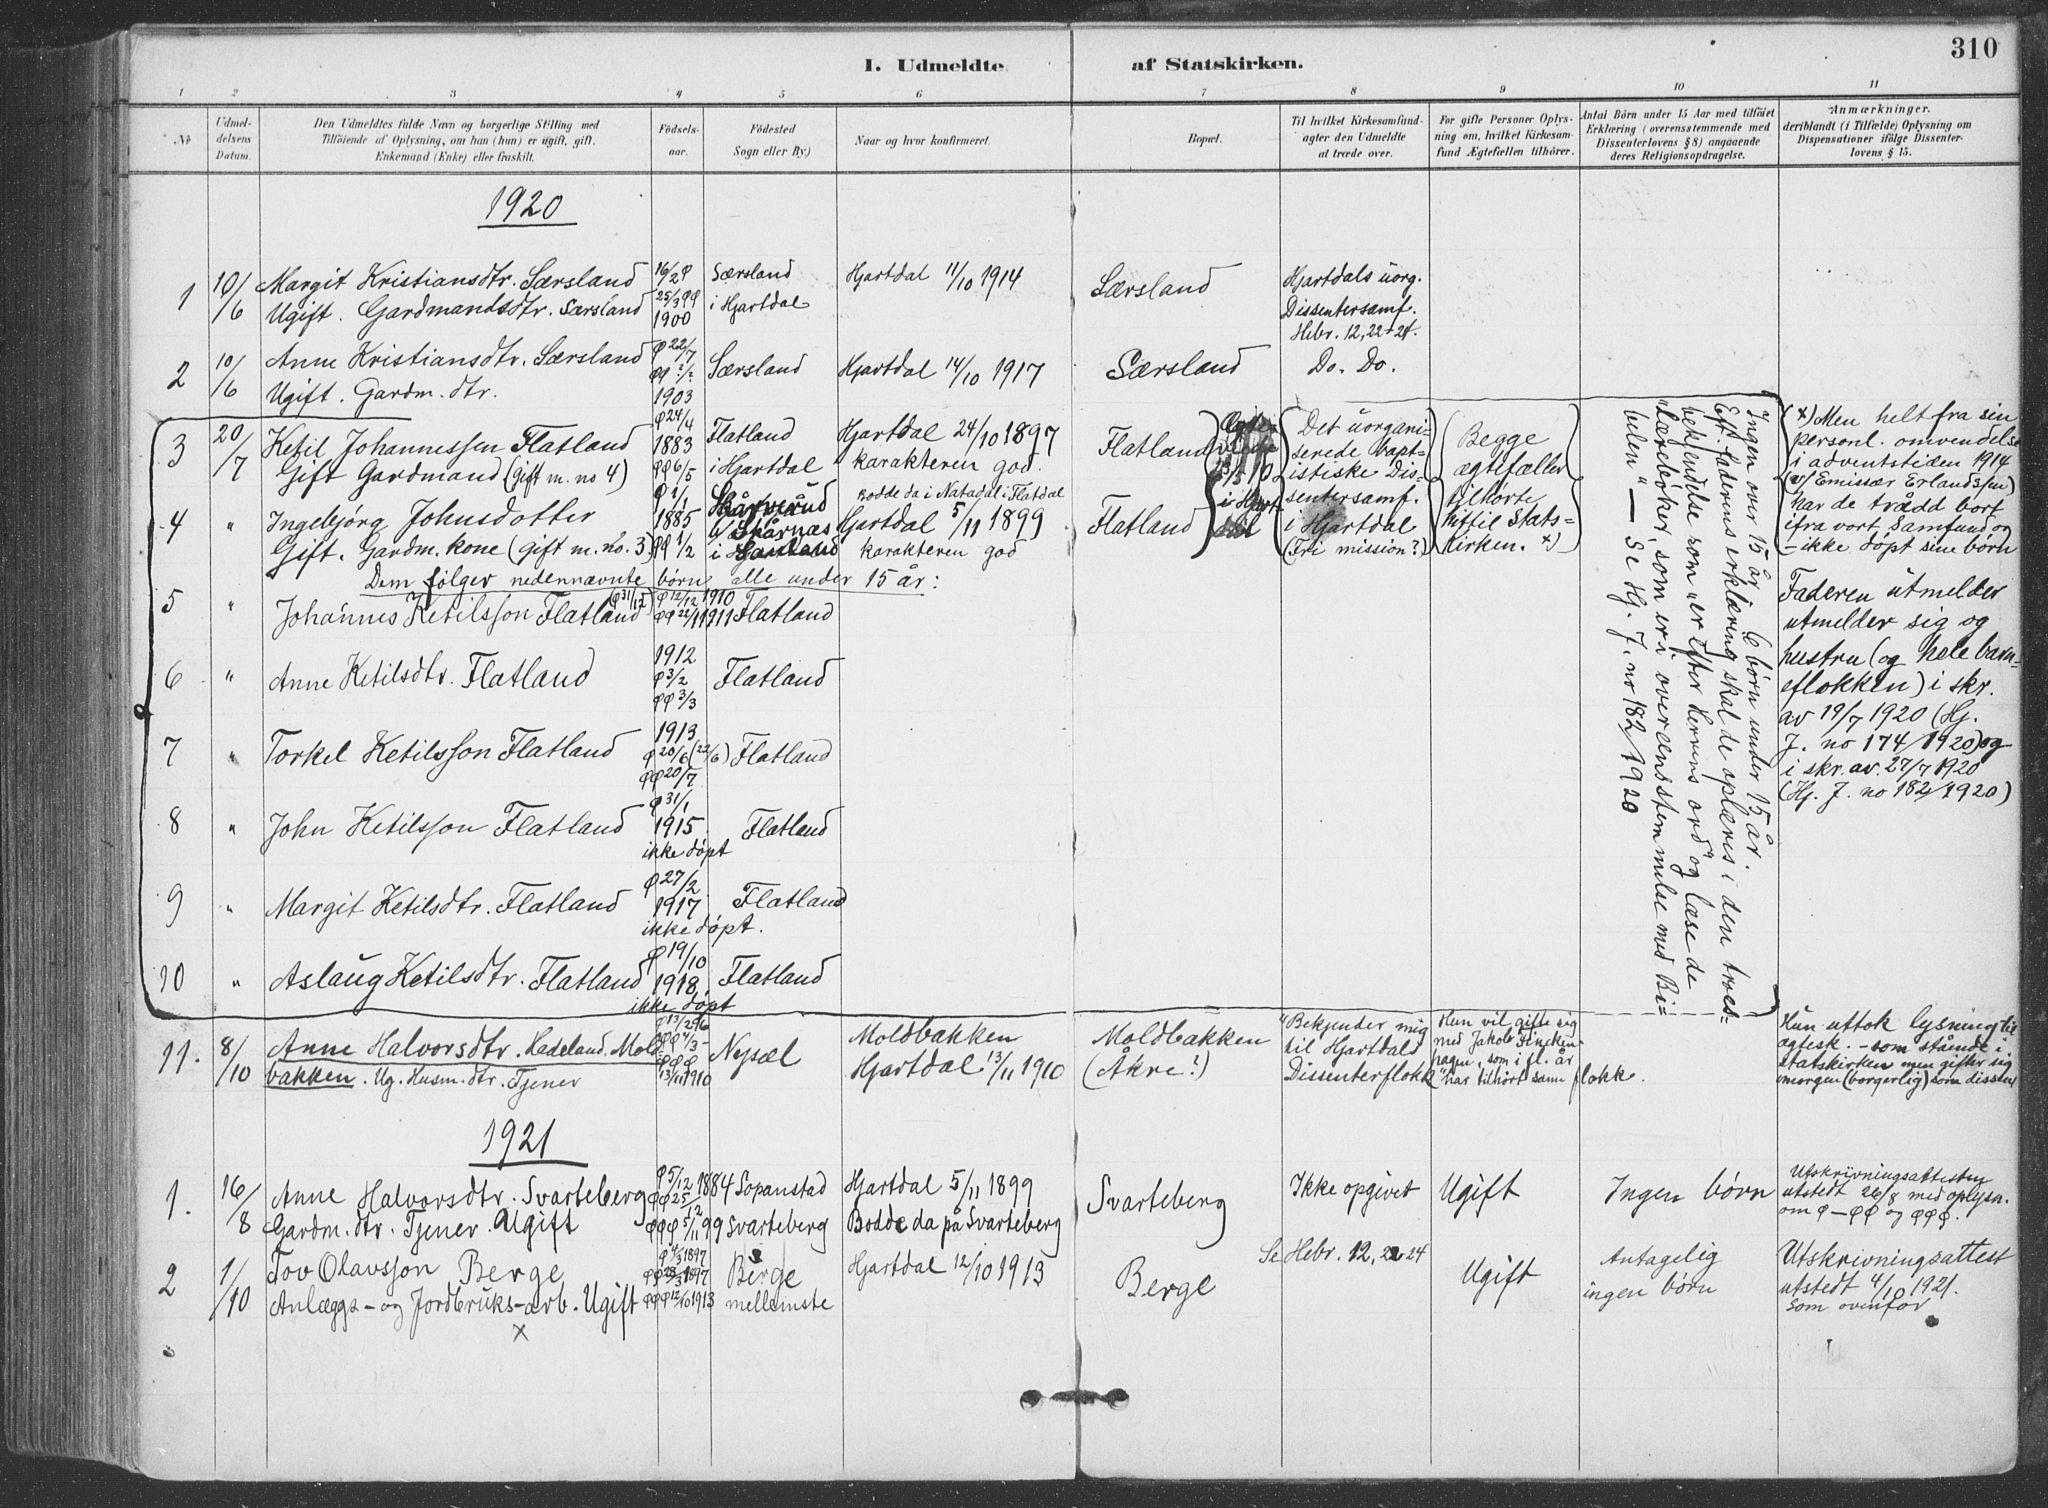 SAKO, Hjartdal kirkebøker, F/Fa/L0010: Ministerialbok nr. I 10, 1880-1929, s. 310